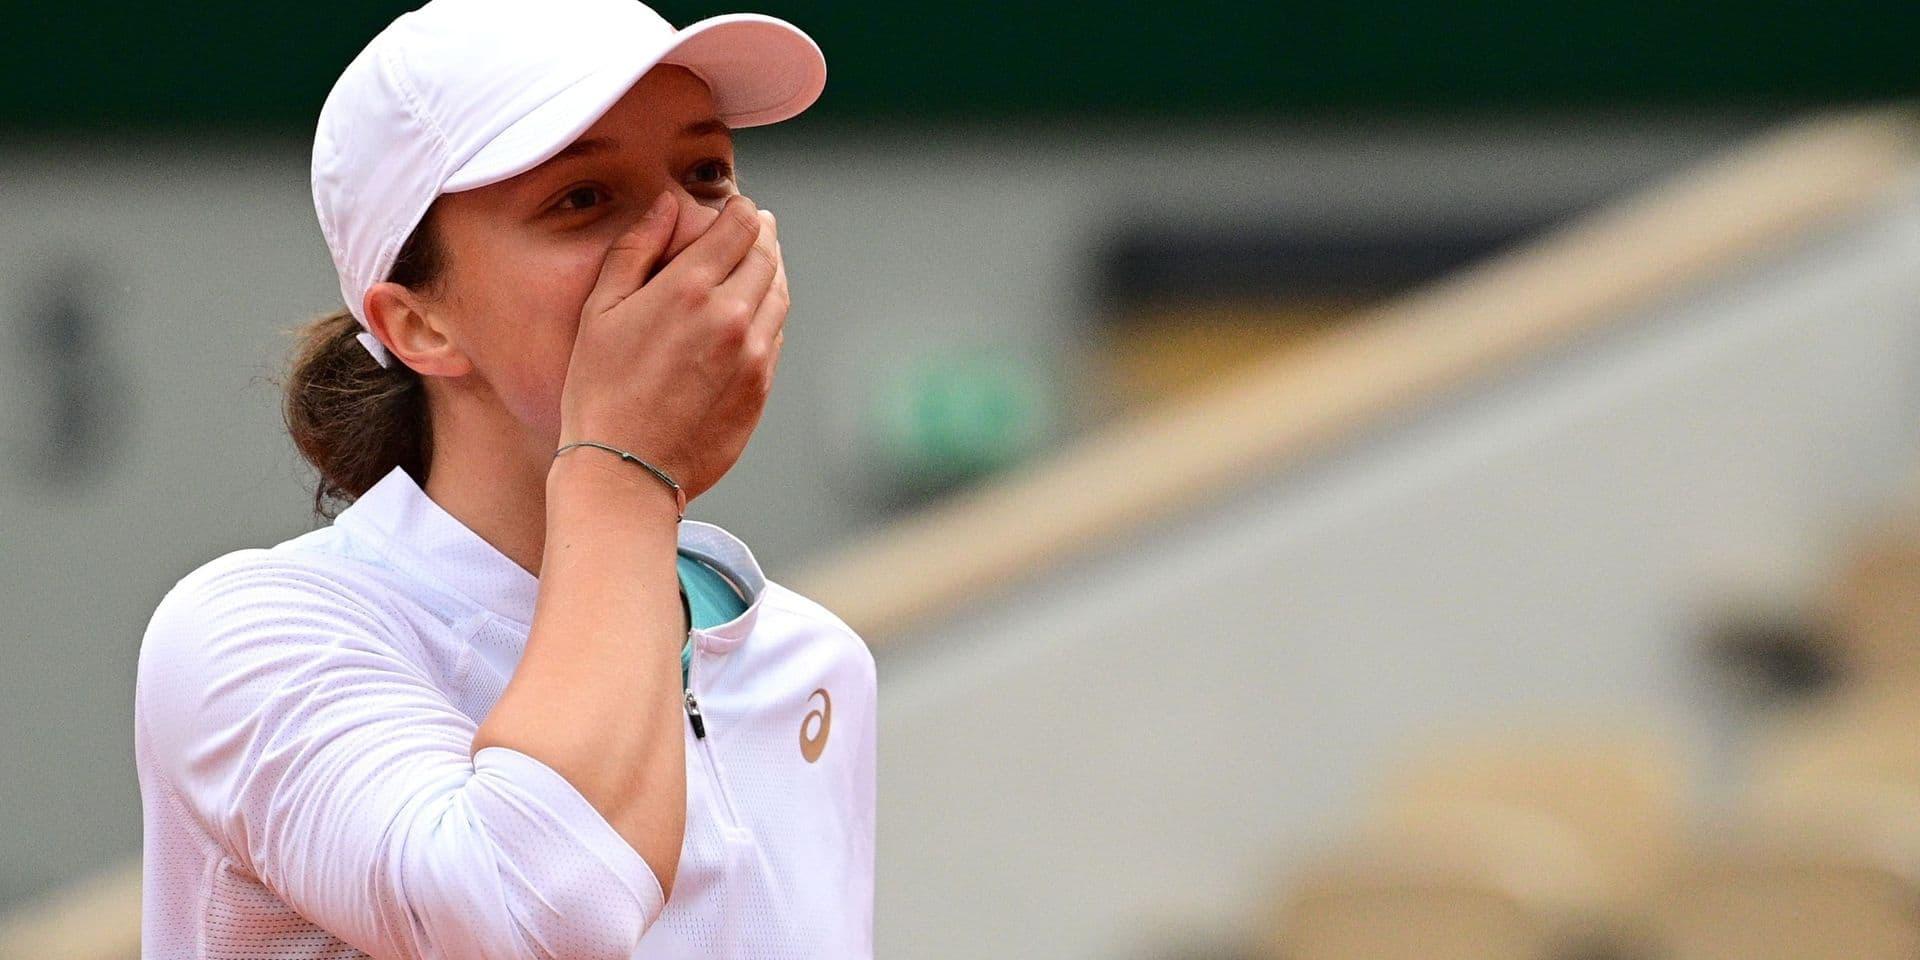 A 19 ans, Iga Swiatek (WTA 54) remporte Roland-Garros, battant Sofia Kenin (WTA 6): 6-4, 6-1